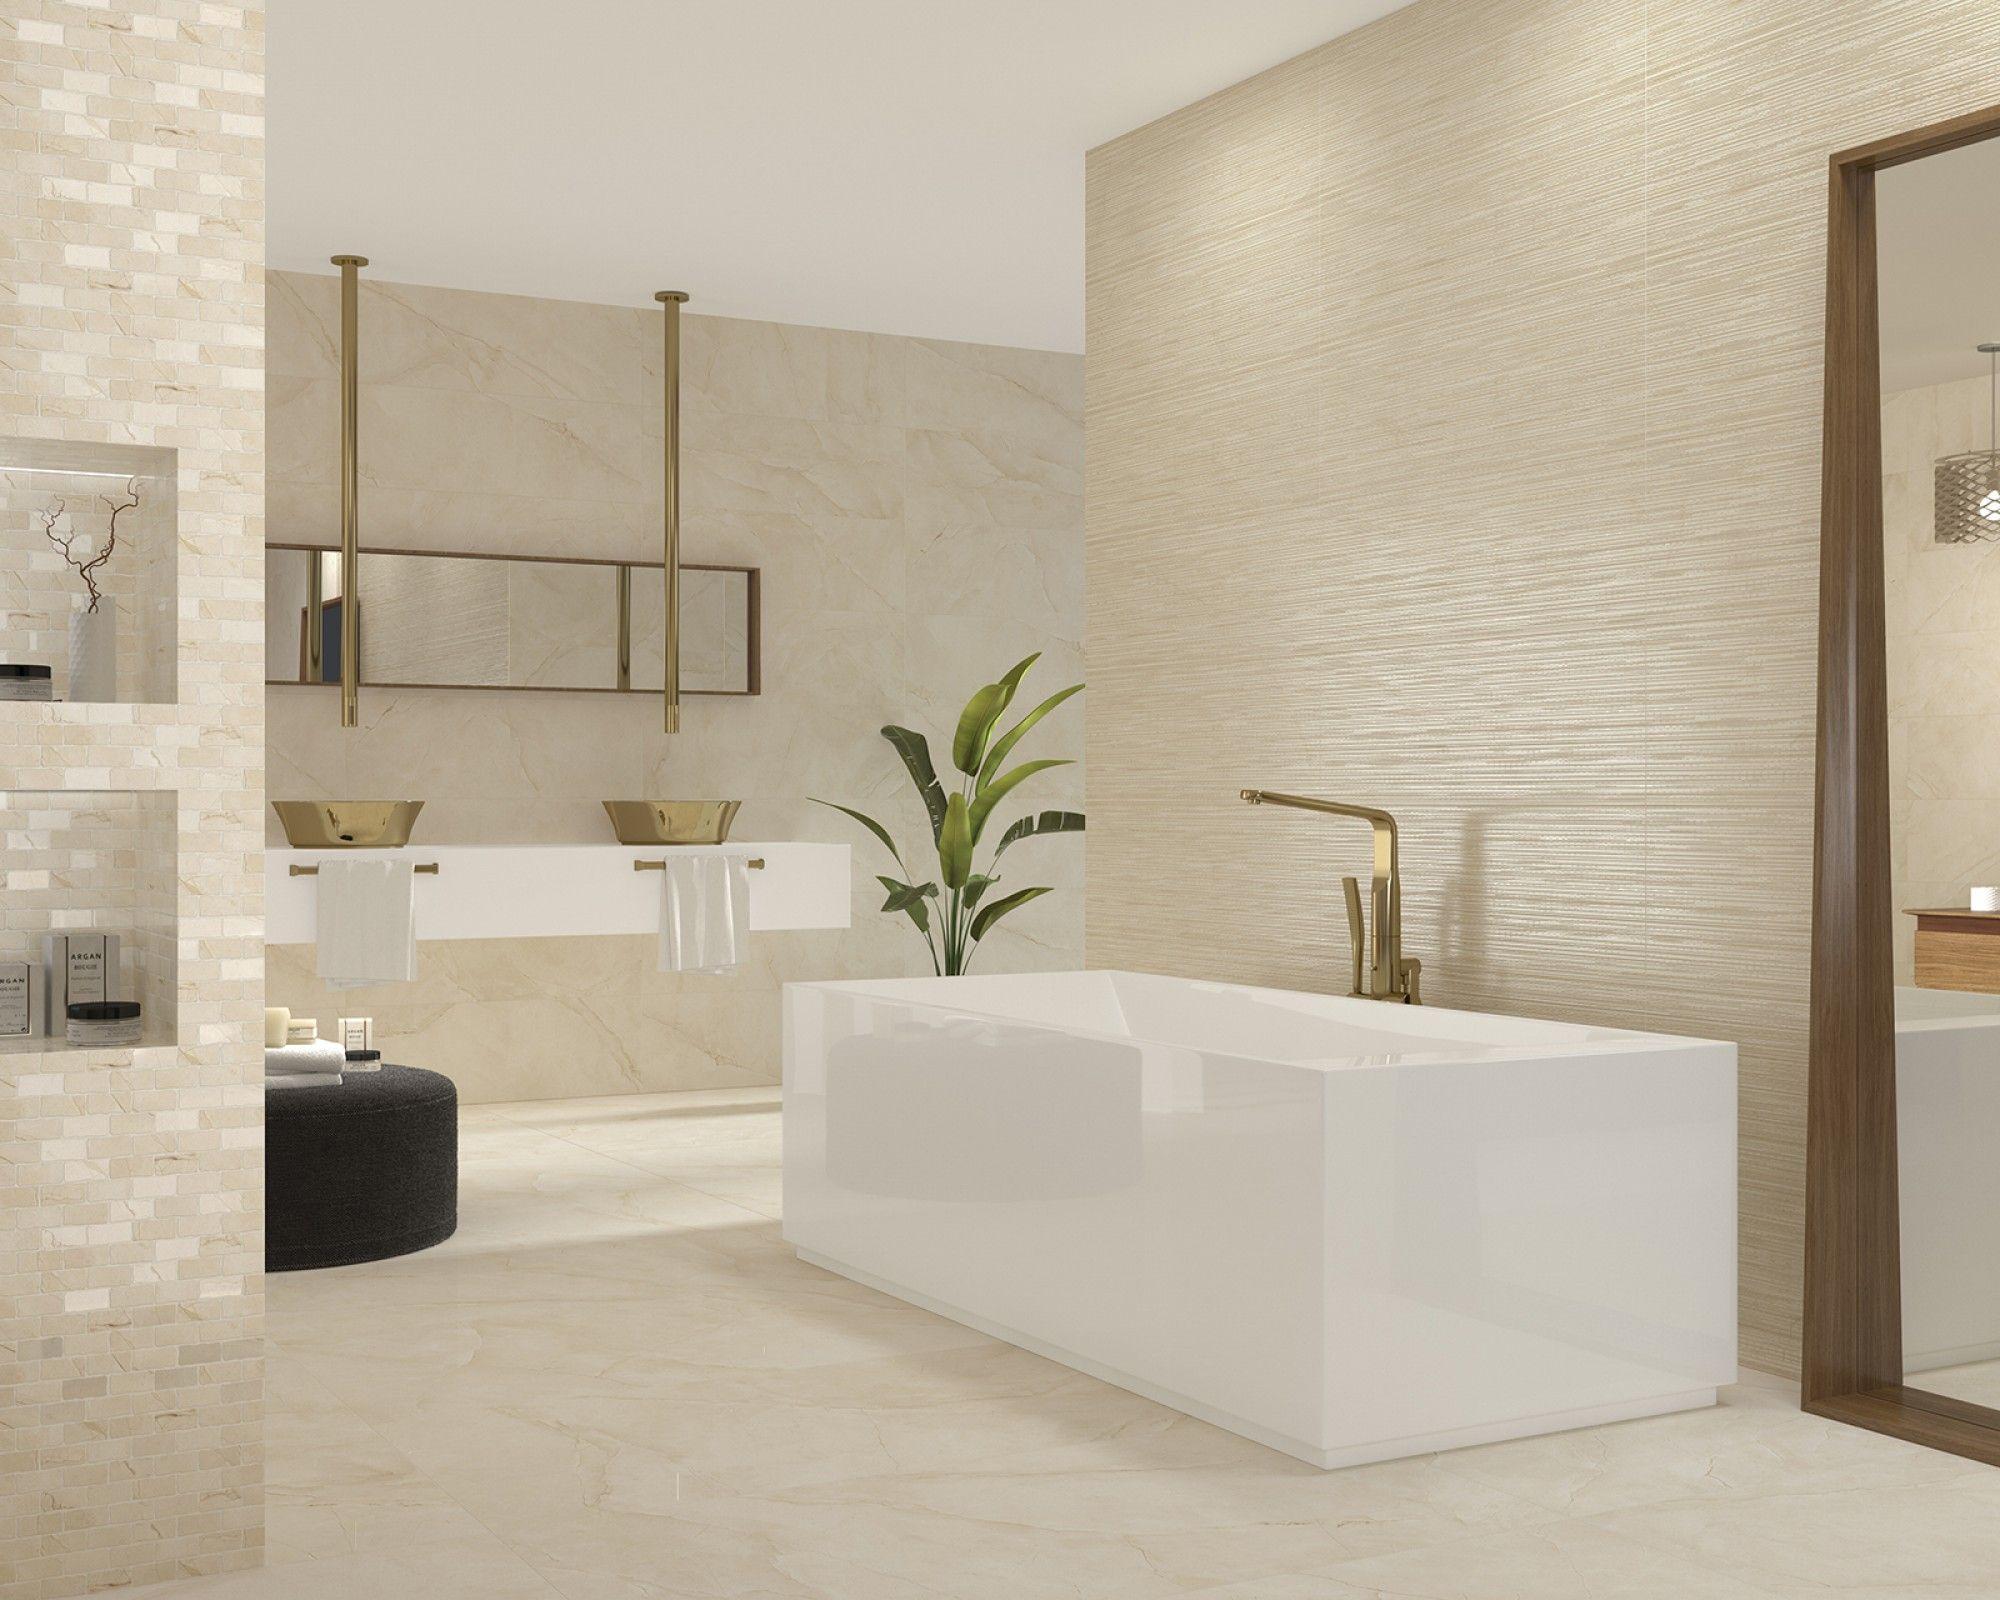 Organza 29 5x90 1 Cm 11 6 X35 5 Wall Tiling Ceramics With